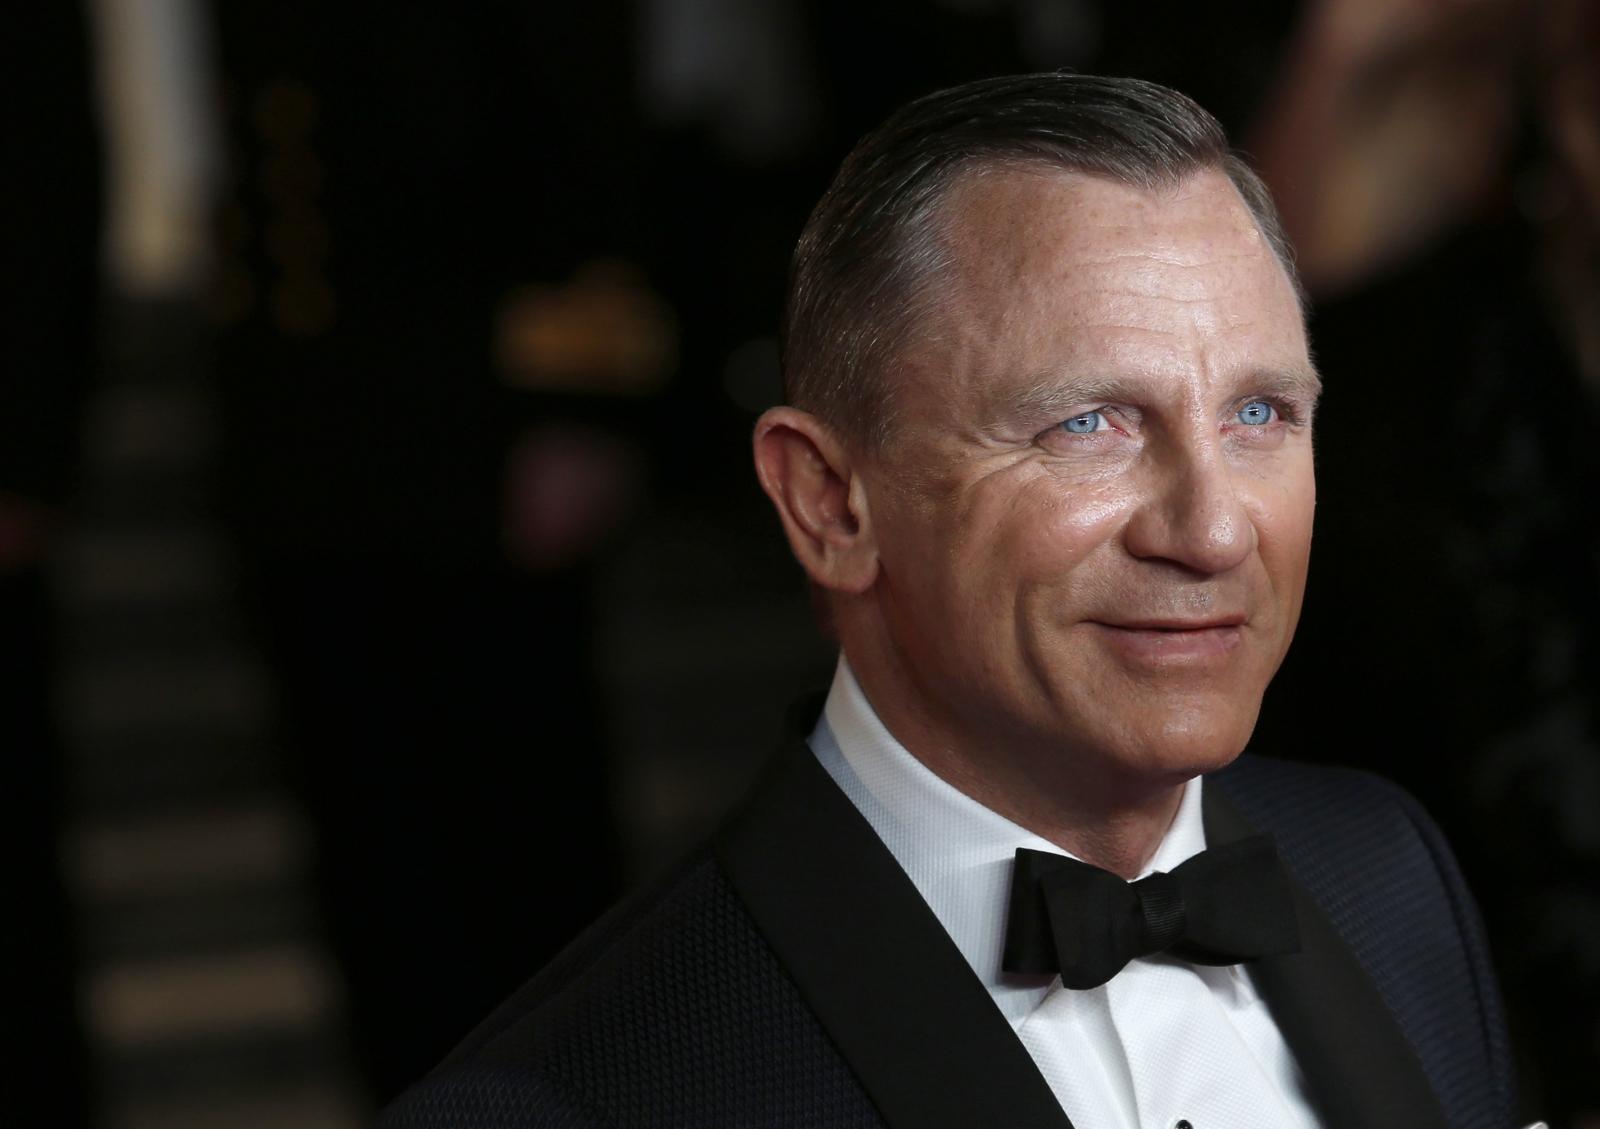 ... Episode VII: James Bond Star Daniel Craig to do Cameo in Next Film Daniel Craig